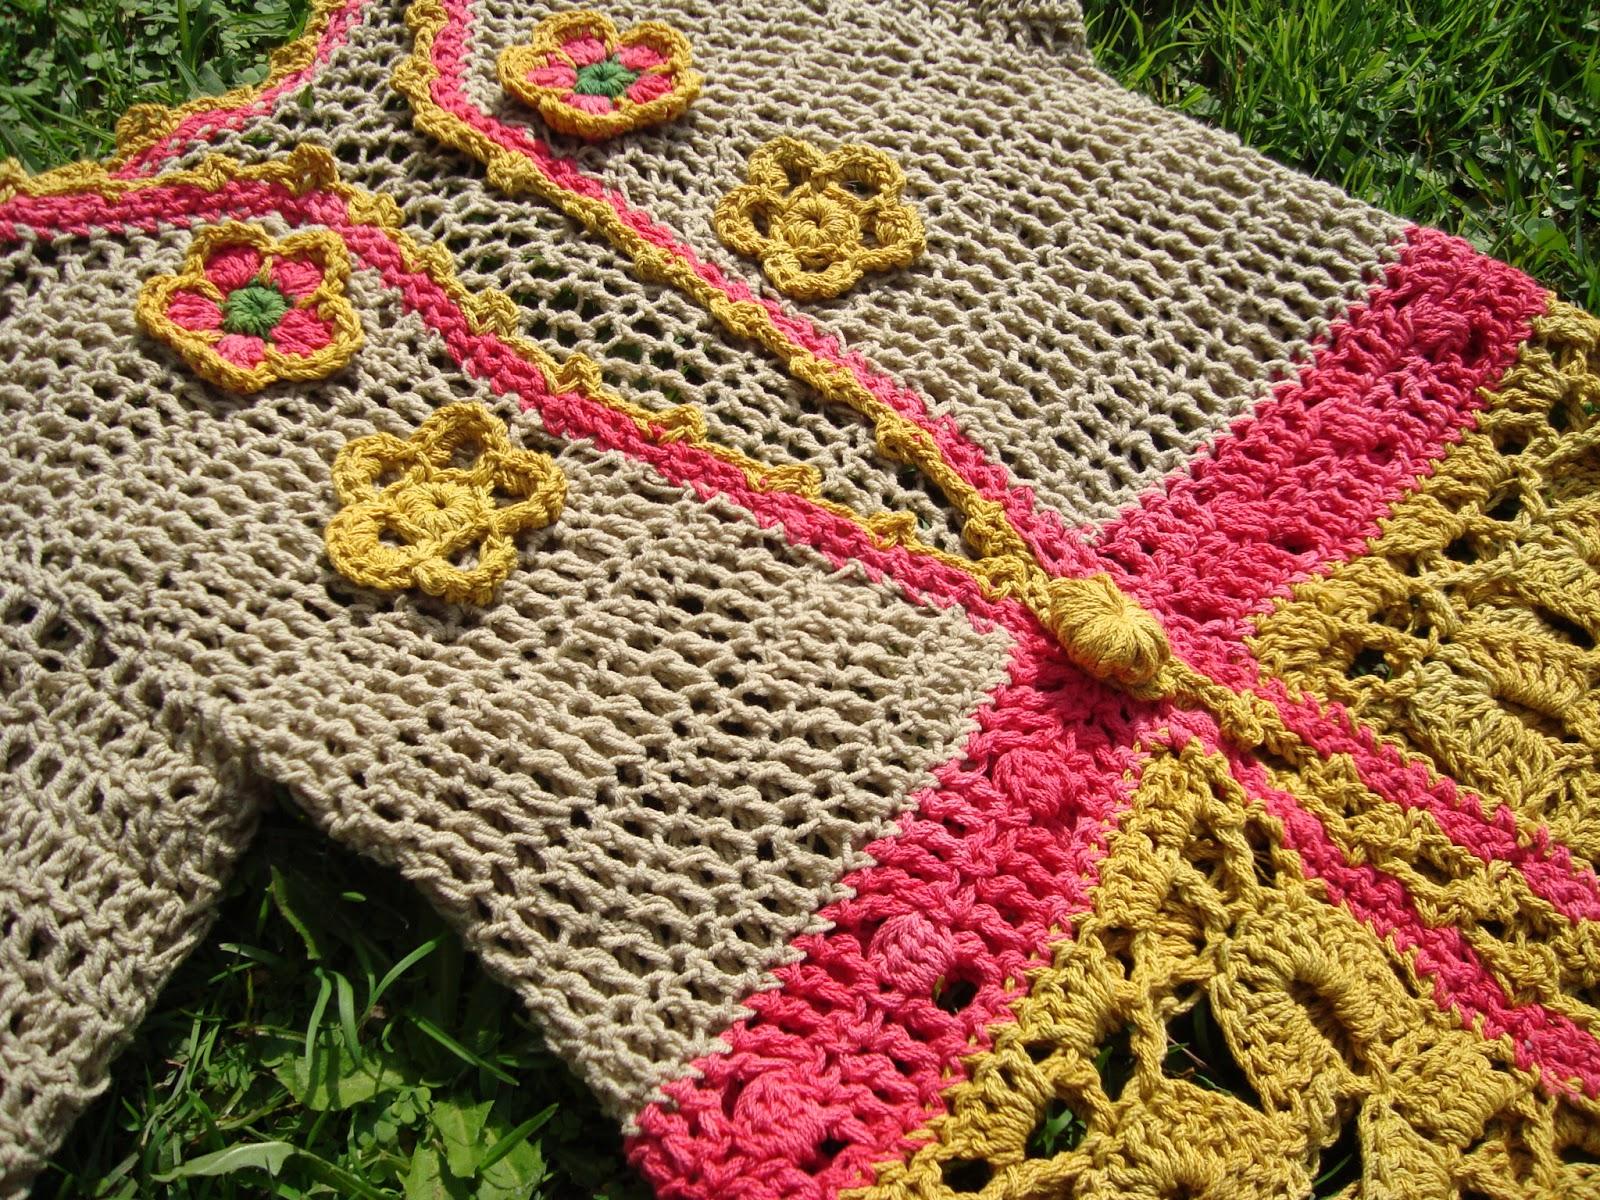 Saquito Tejido Crochet